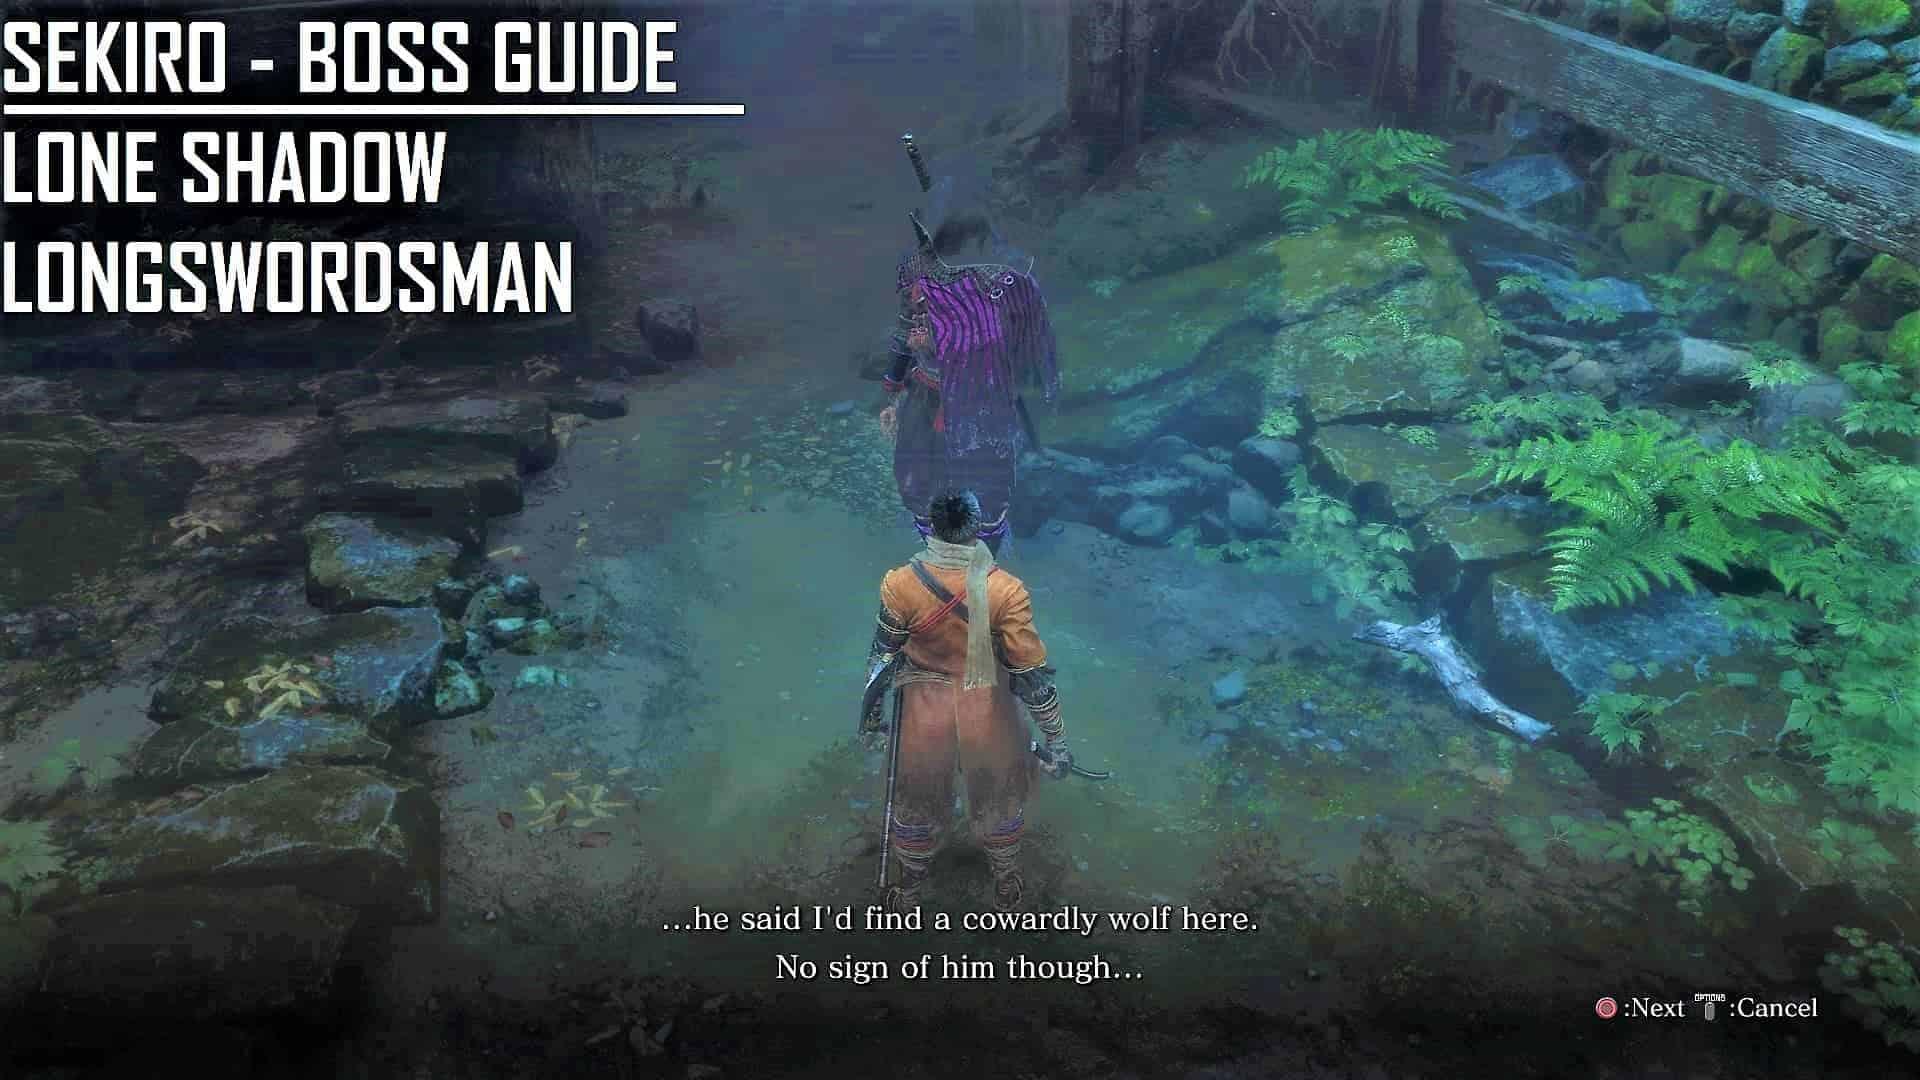 Lone-Shadow Long Swordsman Guide